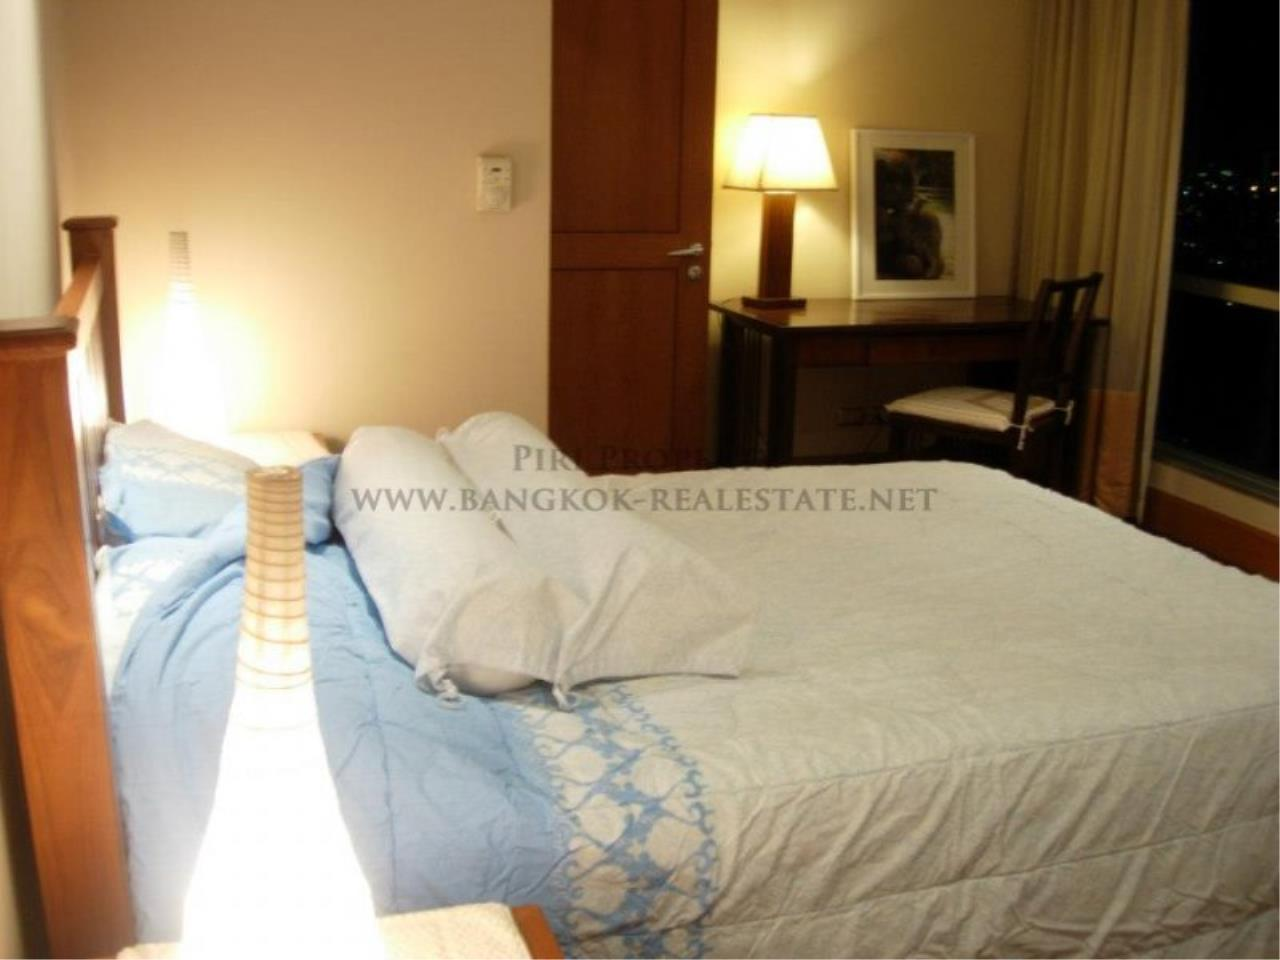 Piri Property Agency's Ascott Sathorn - Spacious 2 Bedroom Condo Unit for Rent - Sky Villa Sathorn 6